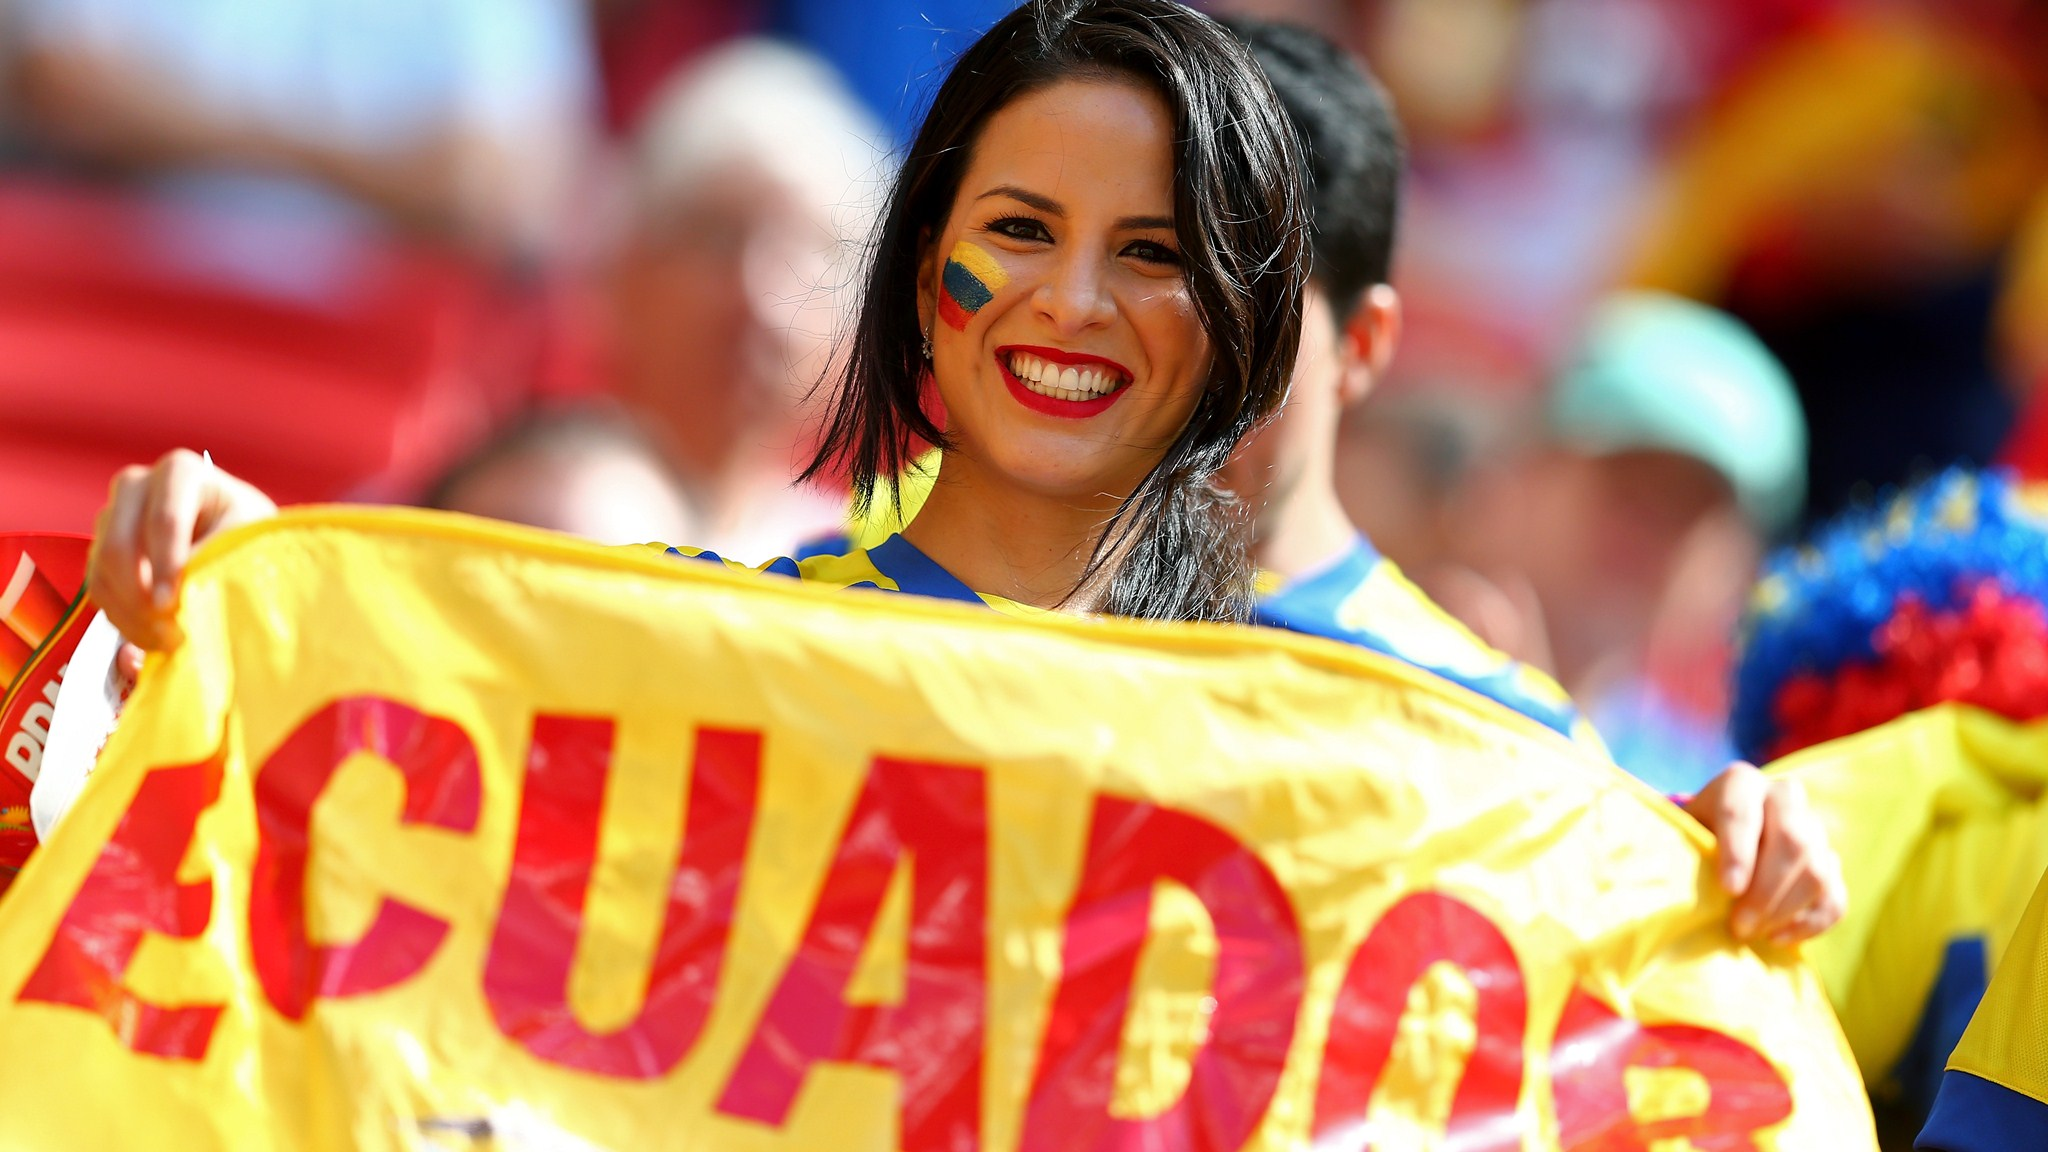 148 - Switzerland-Ecuador [2-1] -- 15 Jun 2014 - 13-00 -- Brasilia - Estadio Nacional